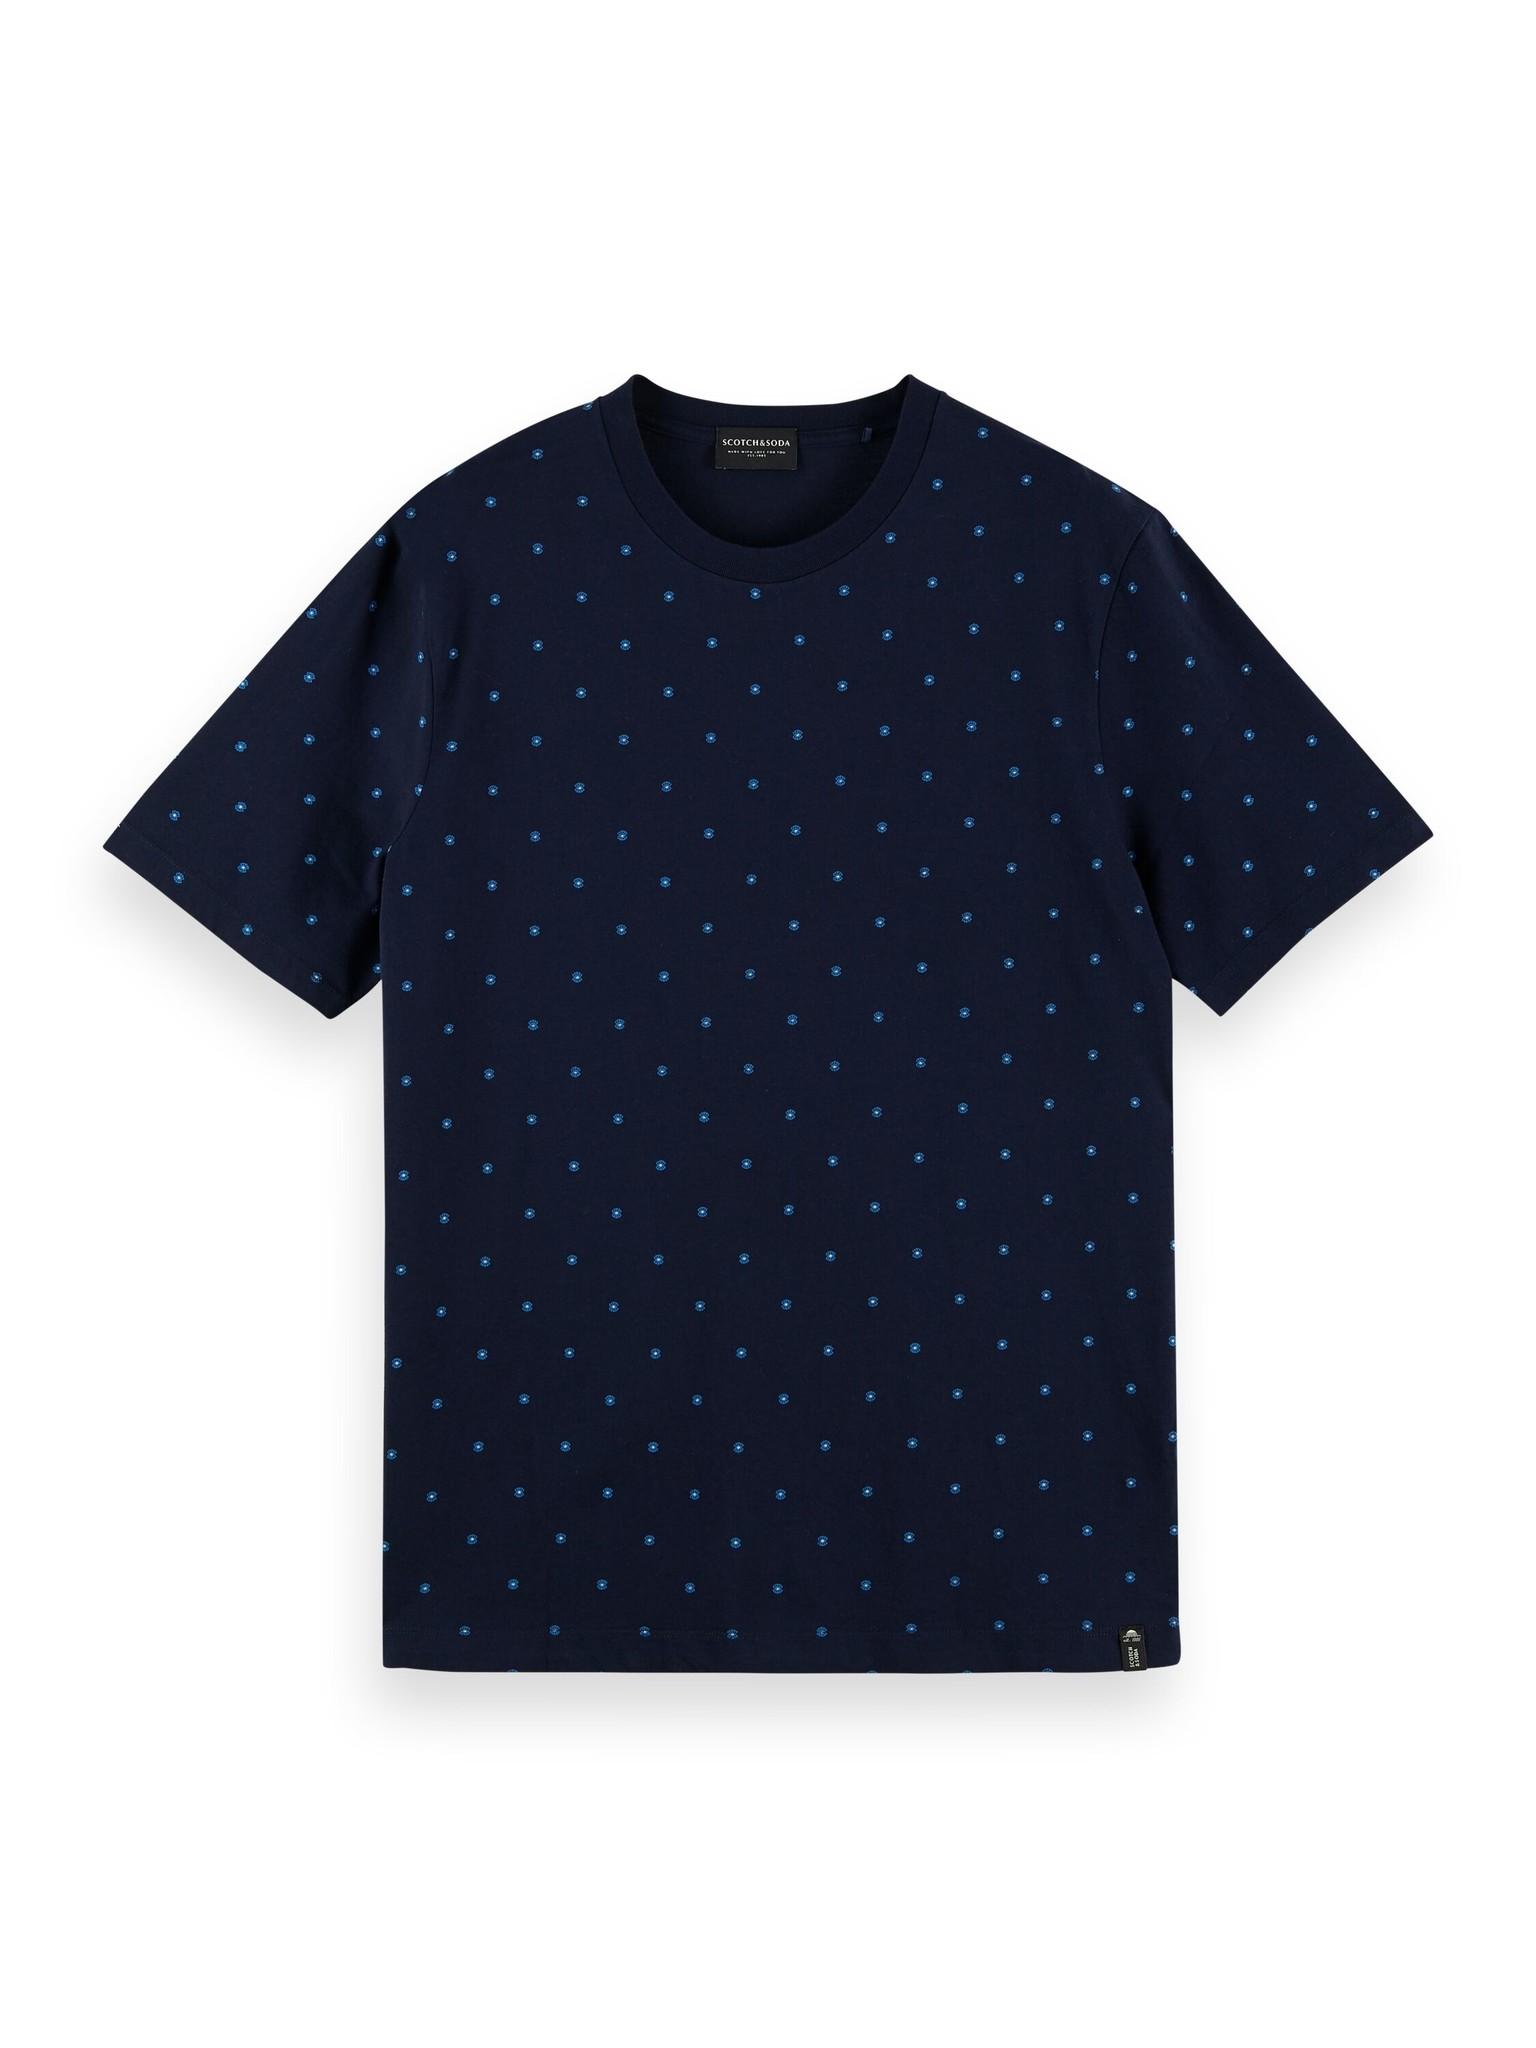 Scotch & Soda T-shirt Scotch & Soda 160854-0222